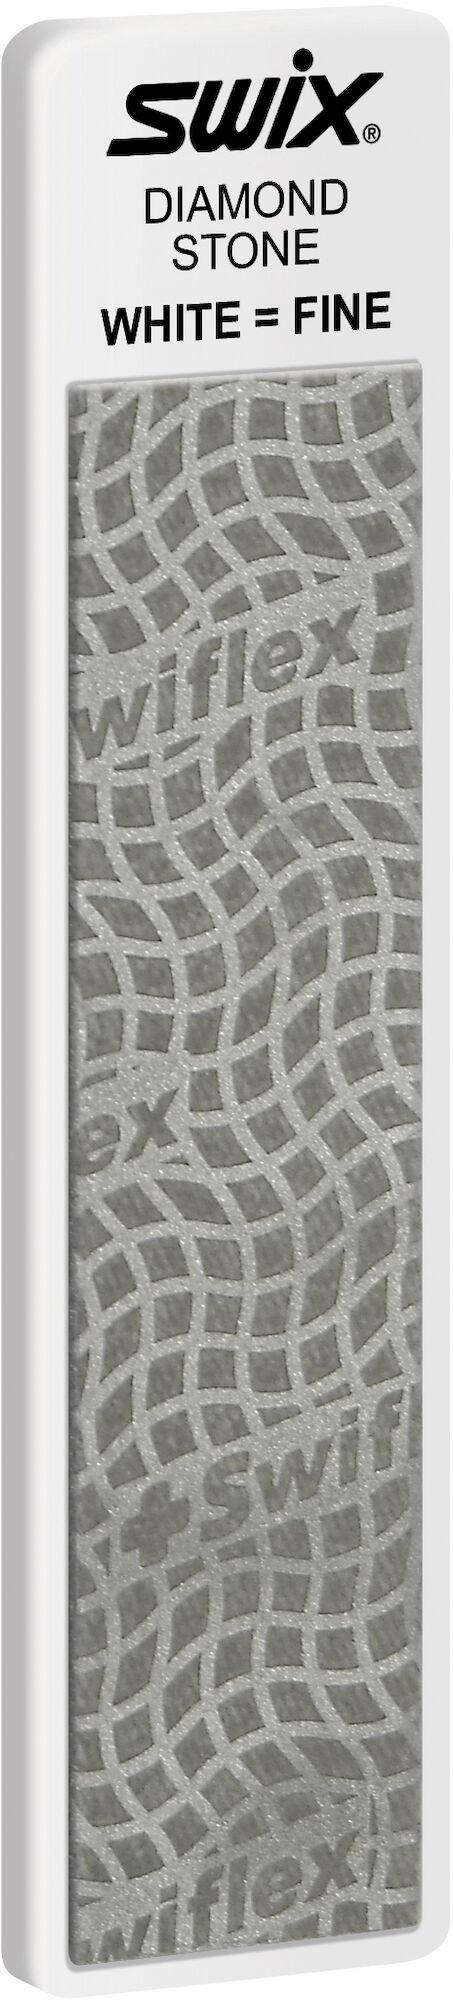 Swix 80mm Diamond Stone for Dual Edger Fine TA600SE White